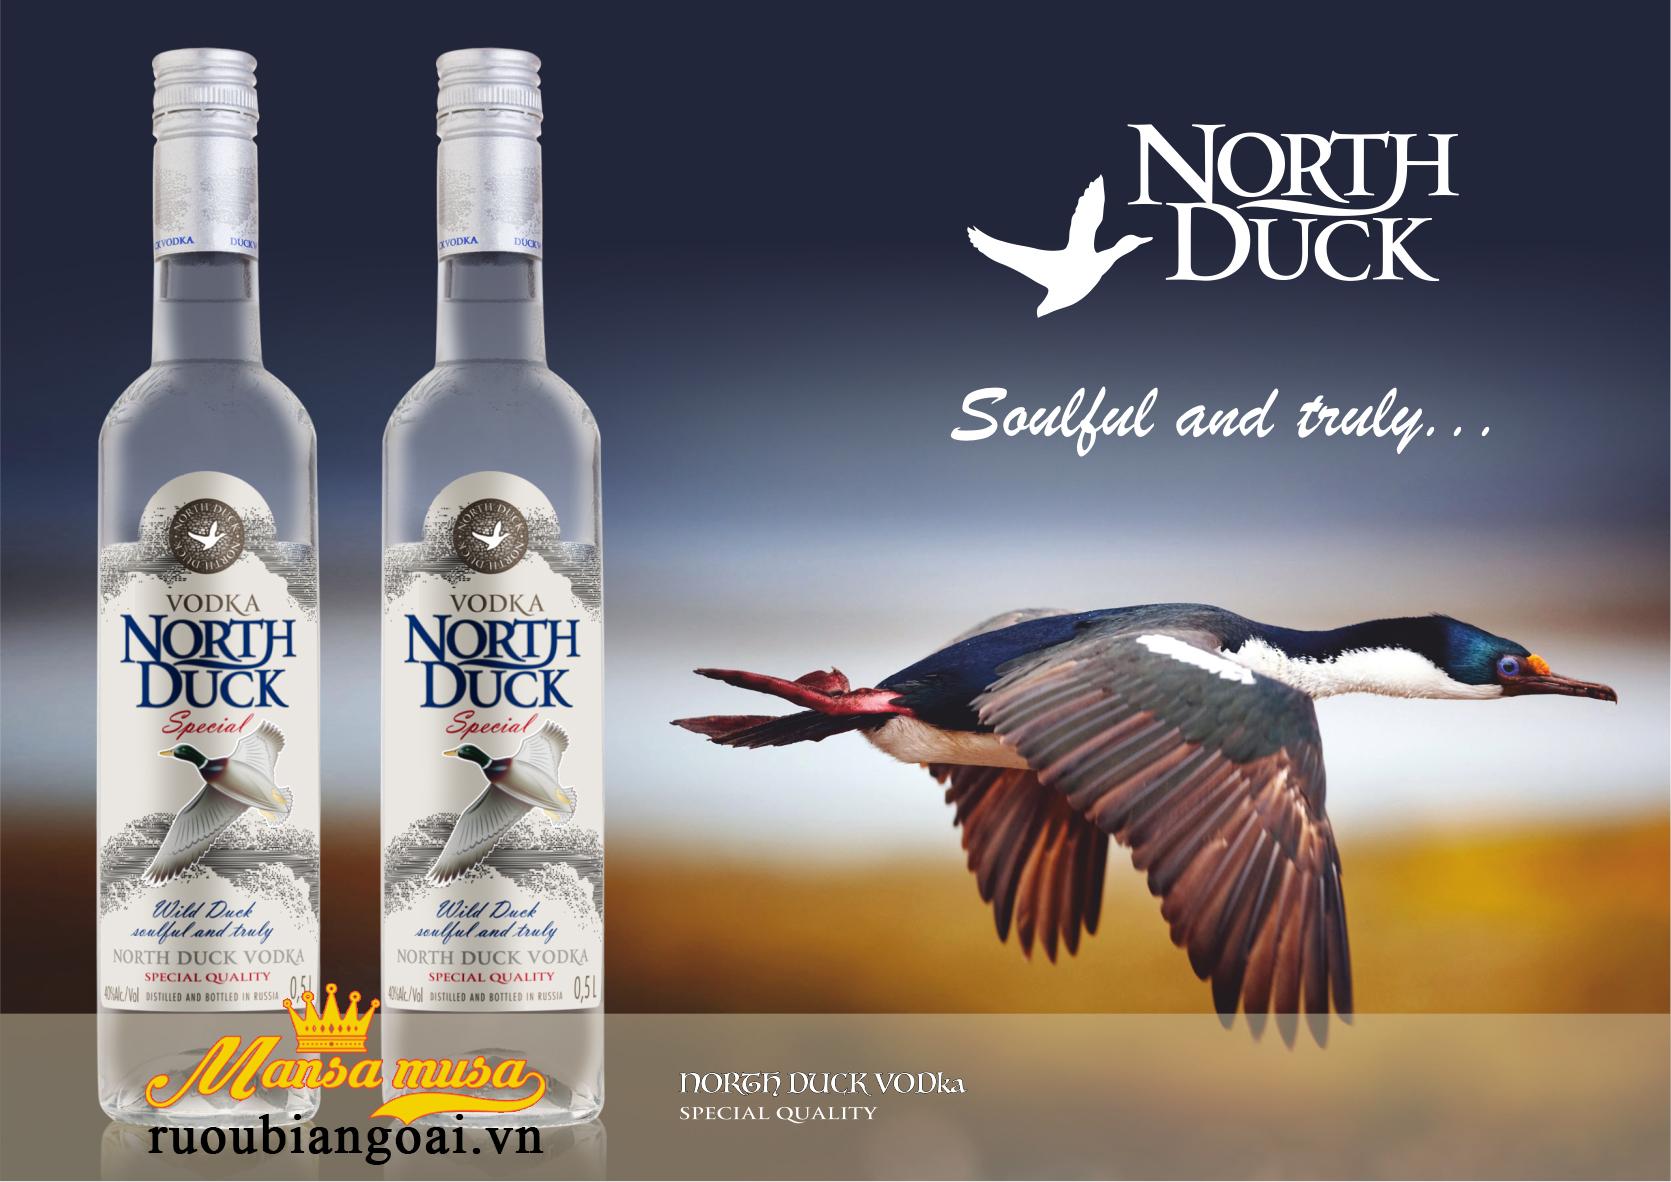 Rượu Vodka North Duck